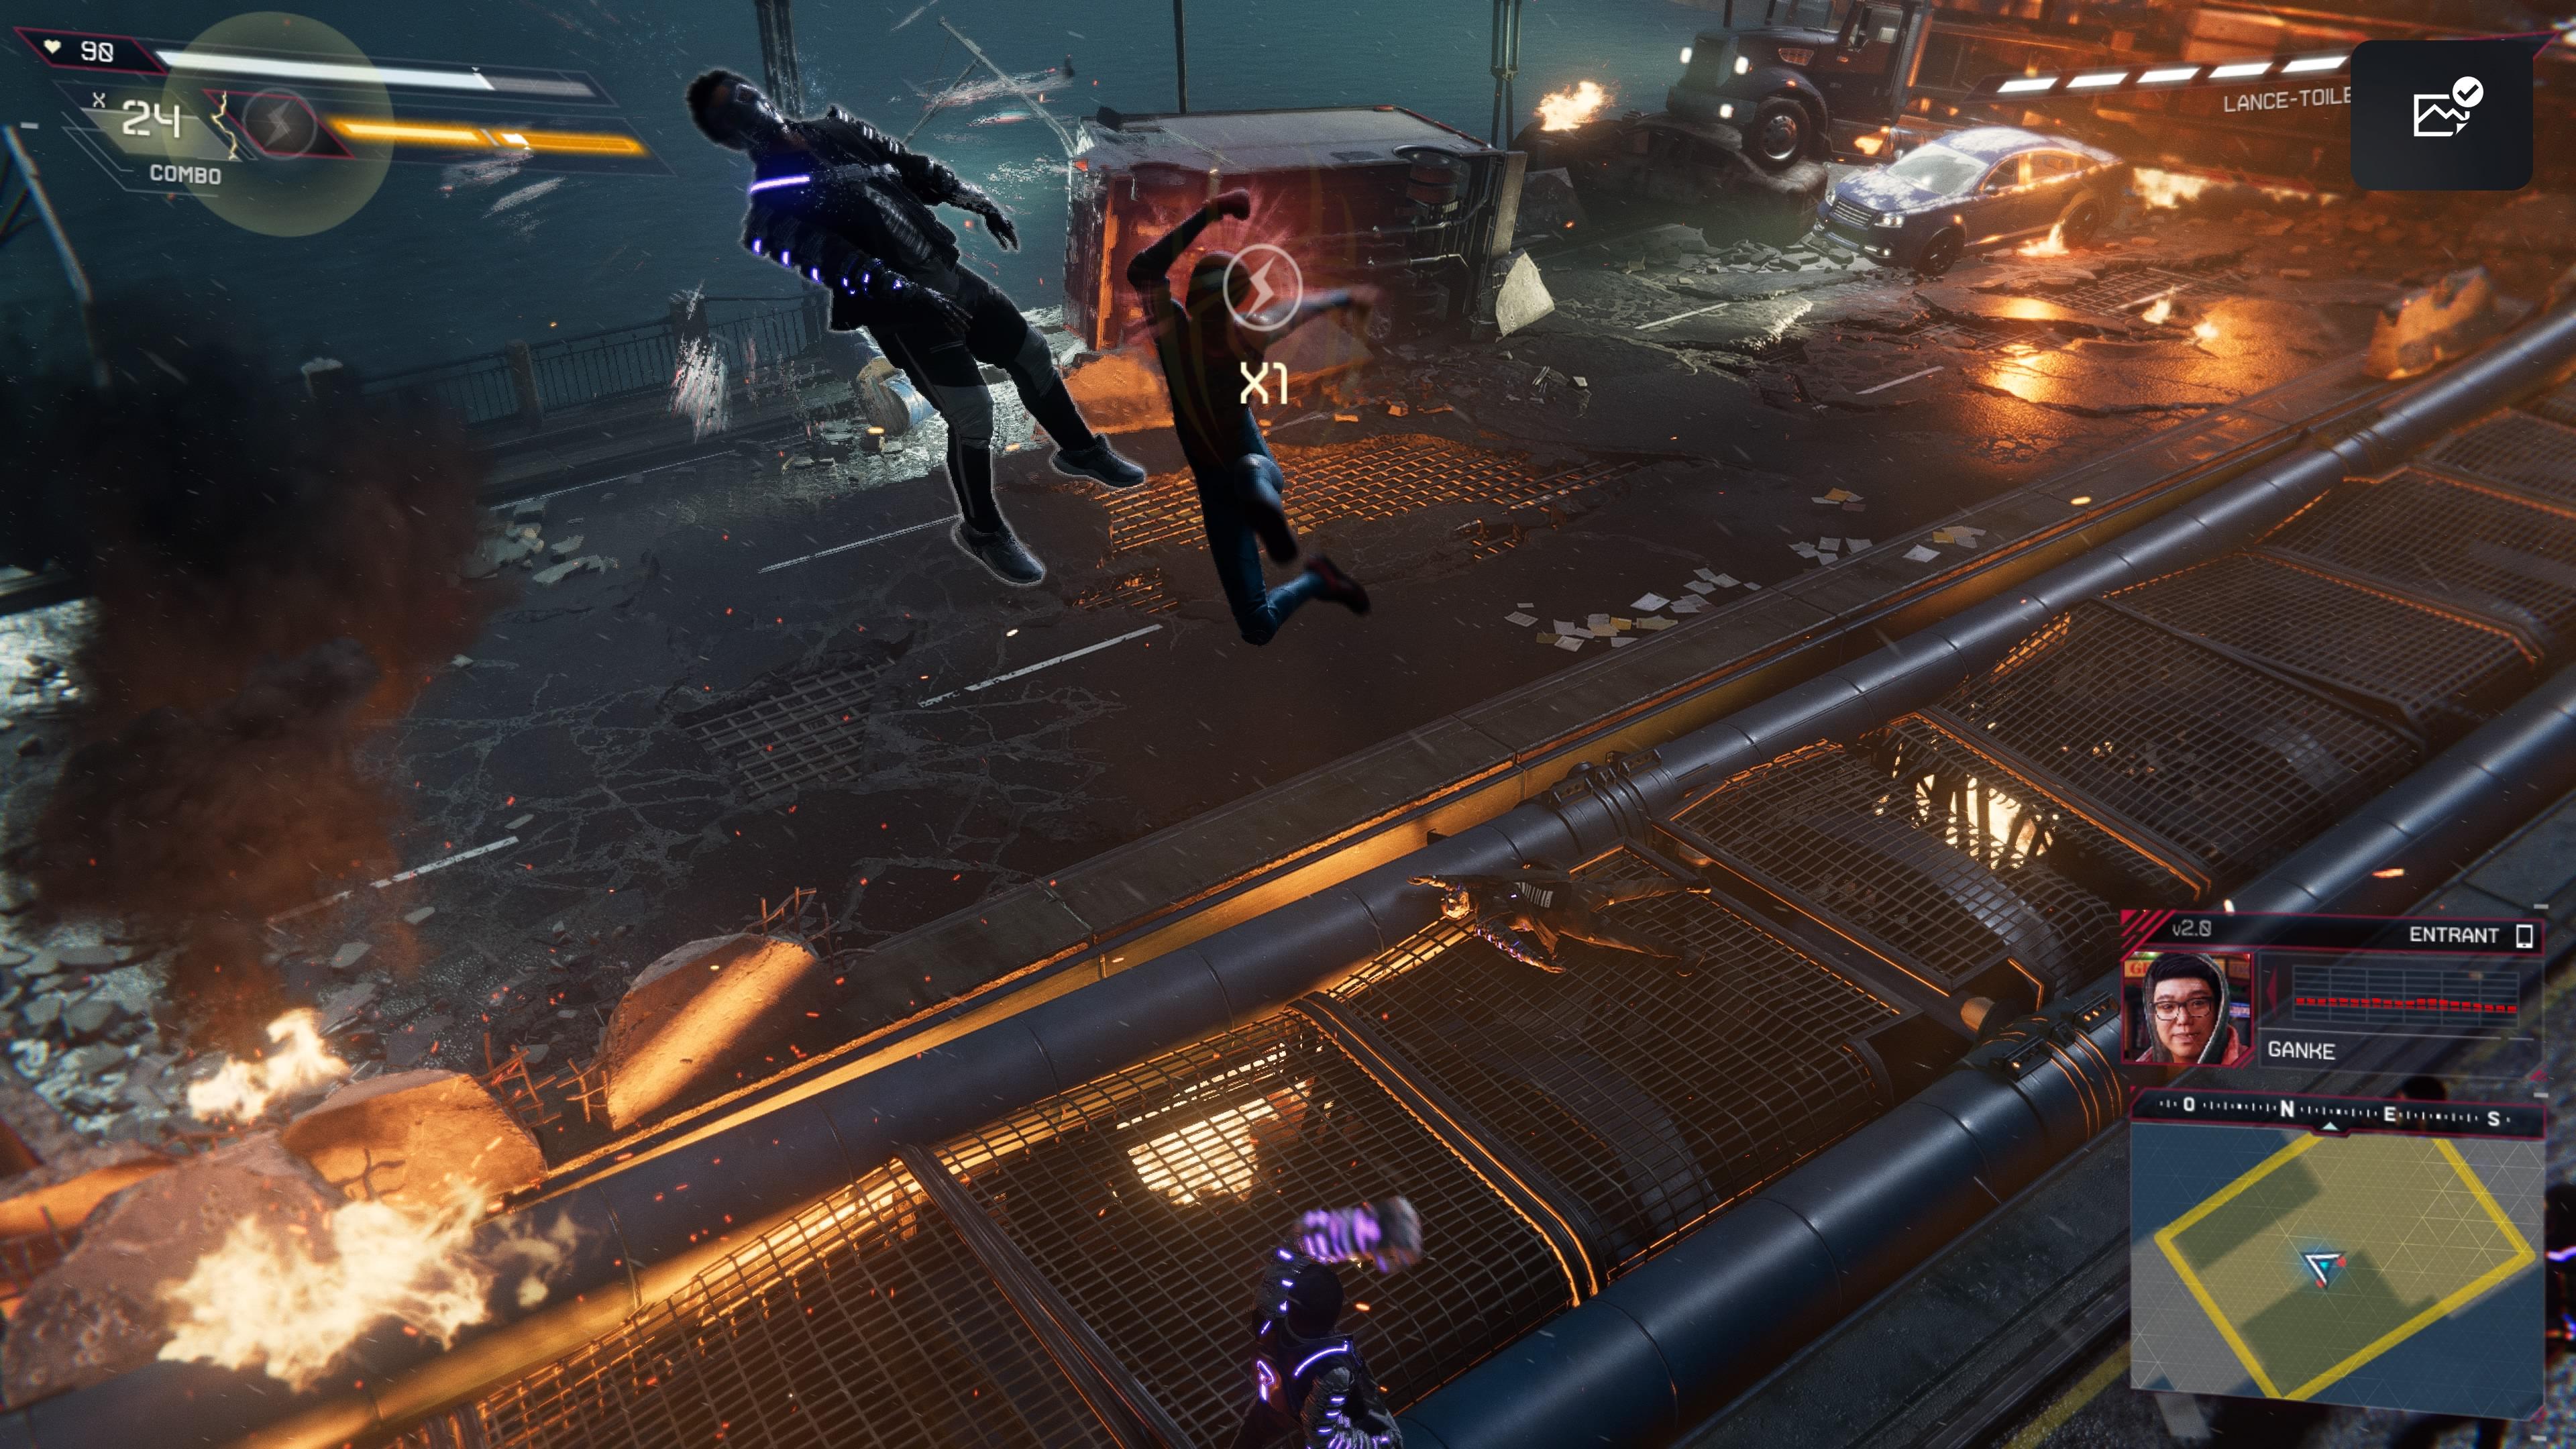 Marvel-sSpider-Man-MilesMorales PS5 Test 010